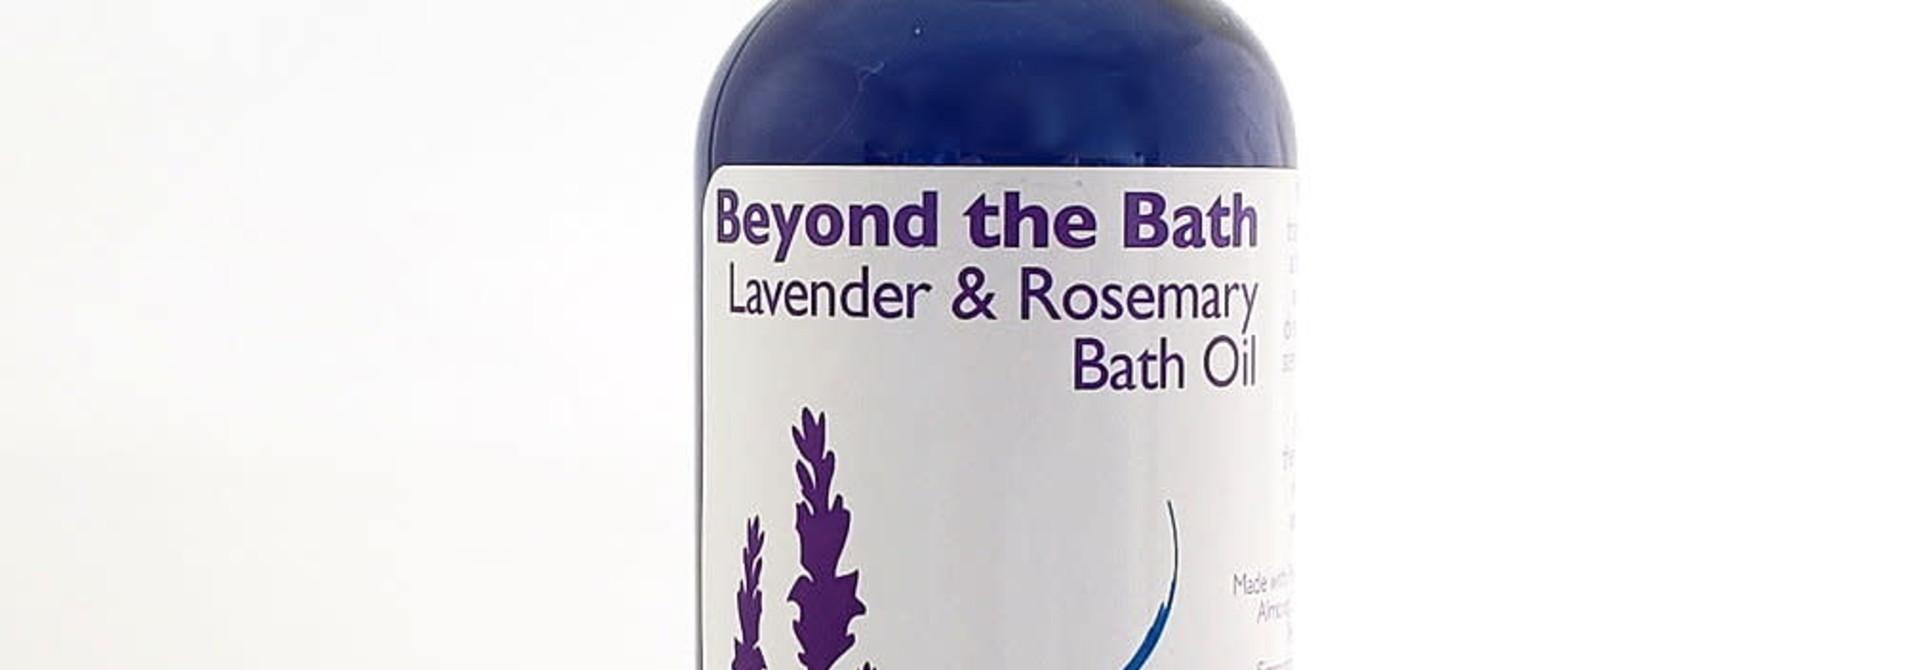 Beyond the Bath (Bath Oil) 2 oz.